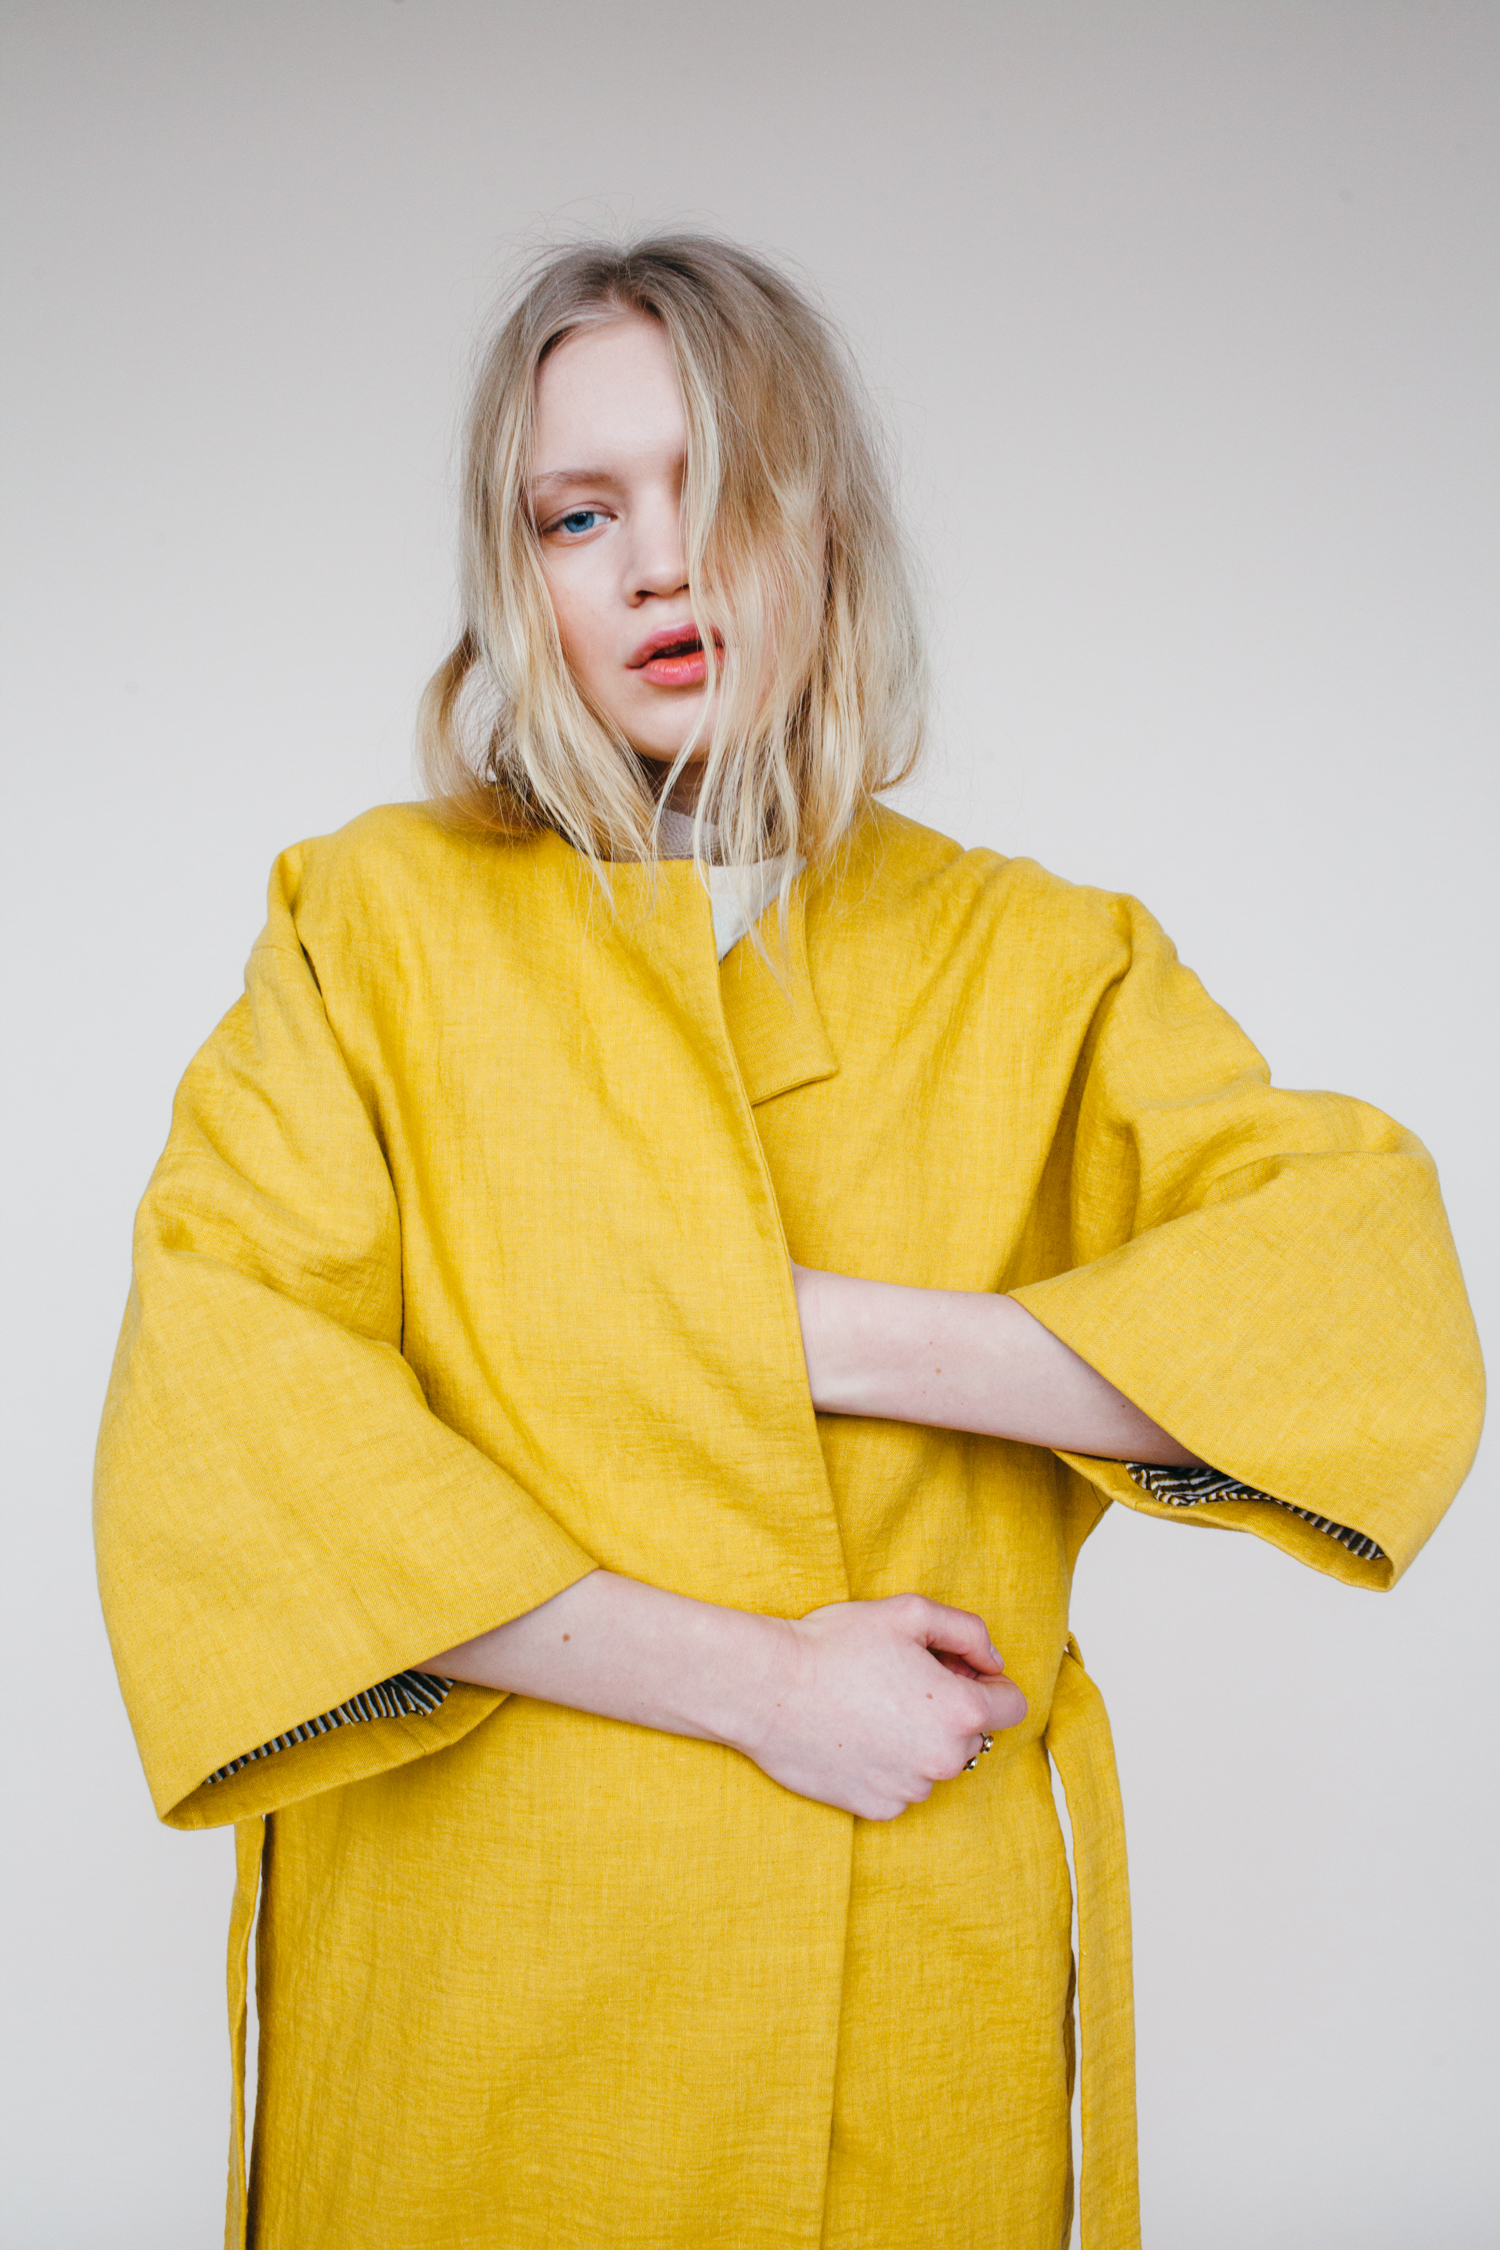 amber_byrne_mahoney_bullet_magazine_editorial_fashion_photography_001.jpg